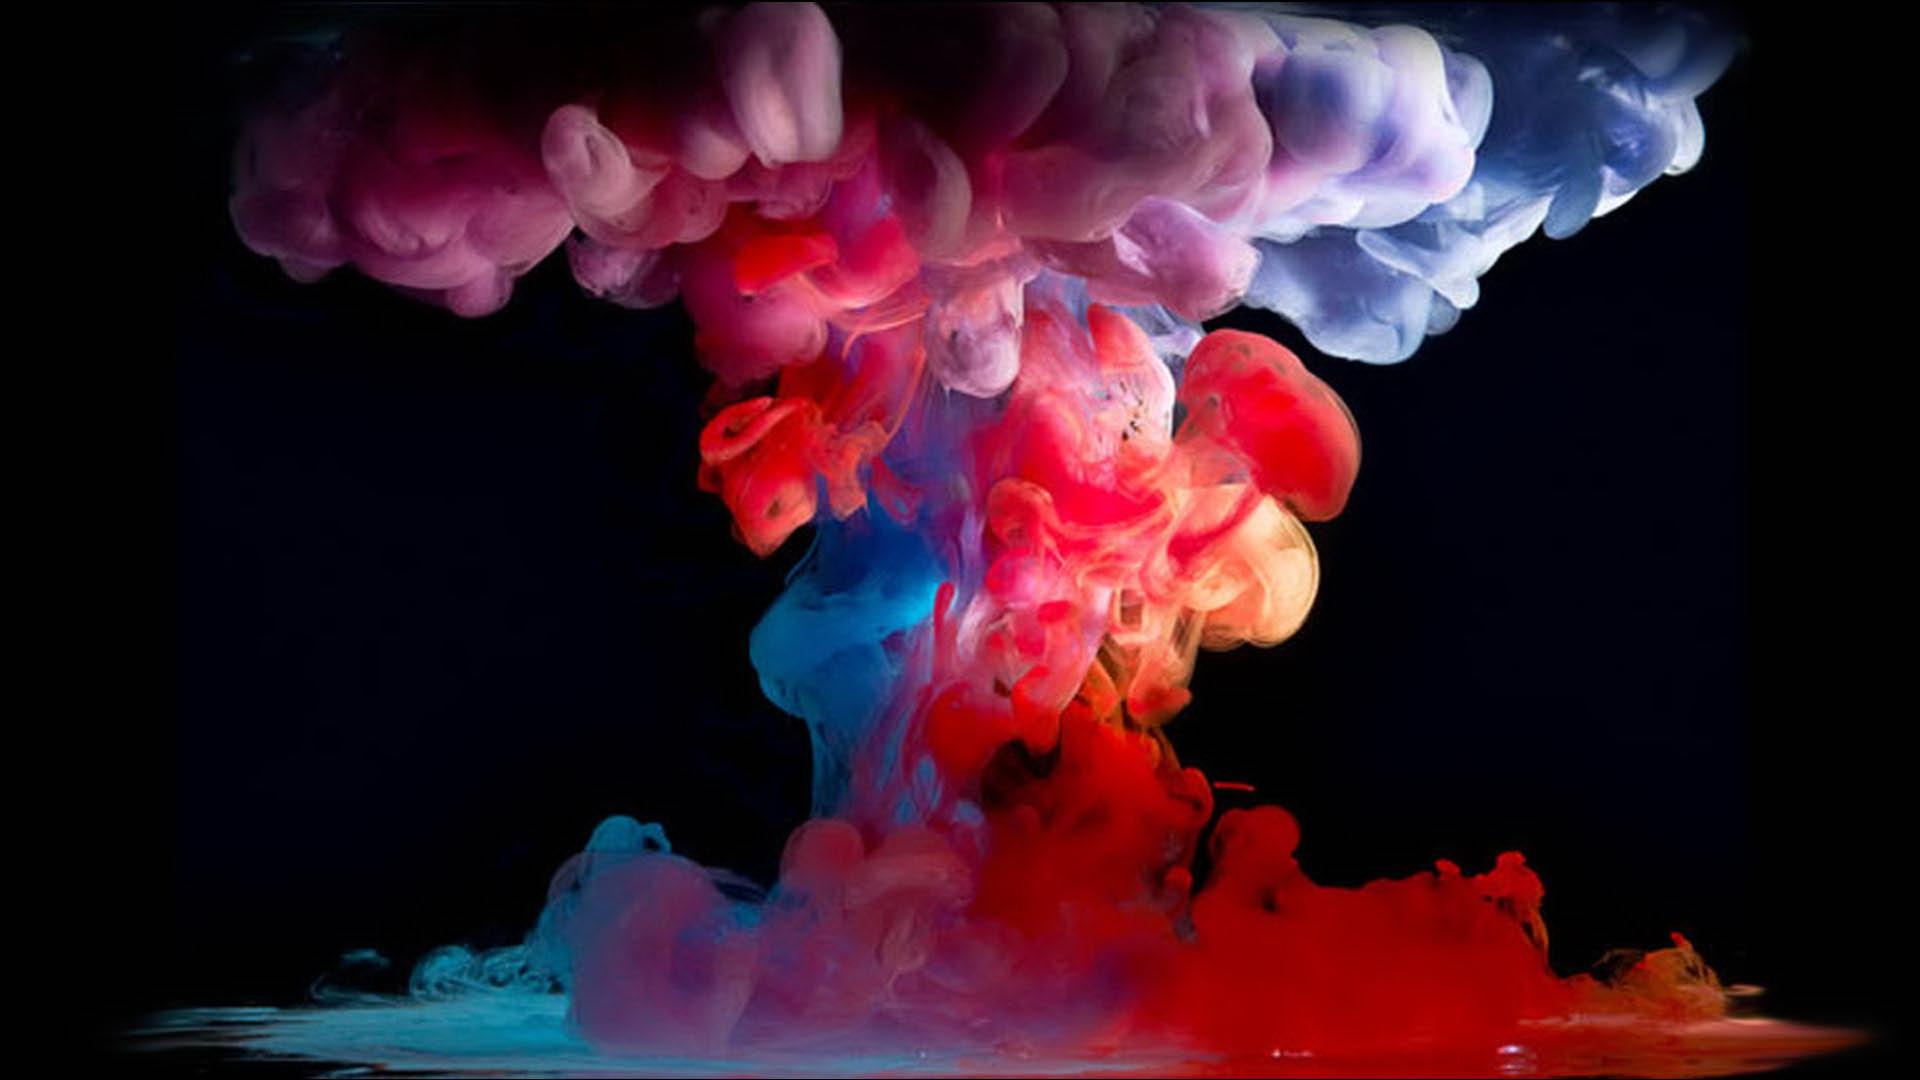 Smoke Full HD Wallpaper And Background Image